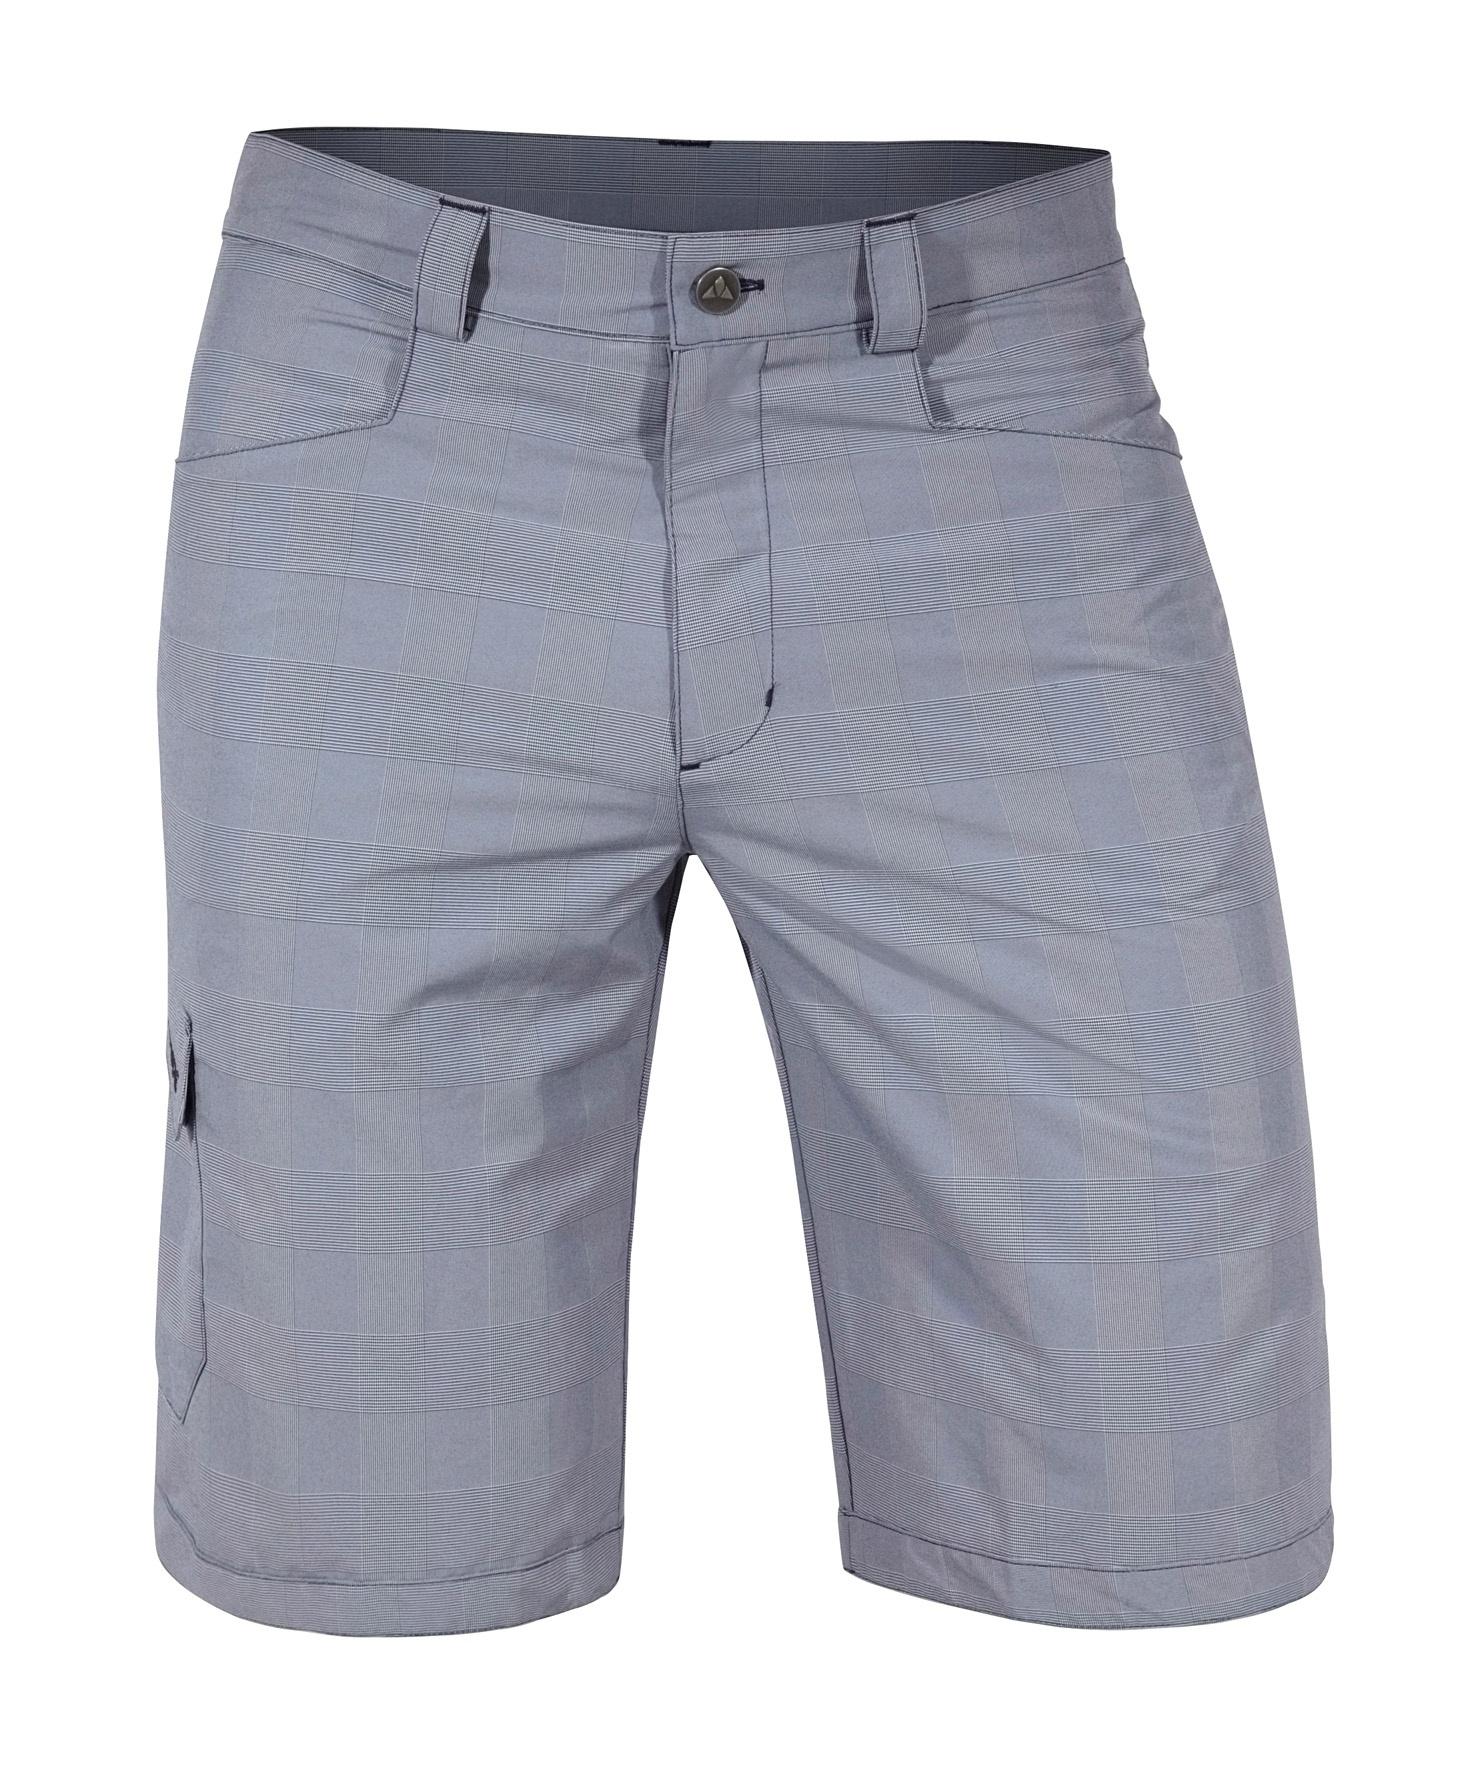 VAUDE Men's Taguna II Shorts, Indigo, Small